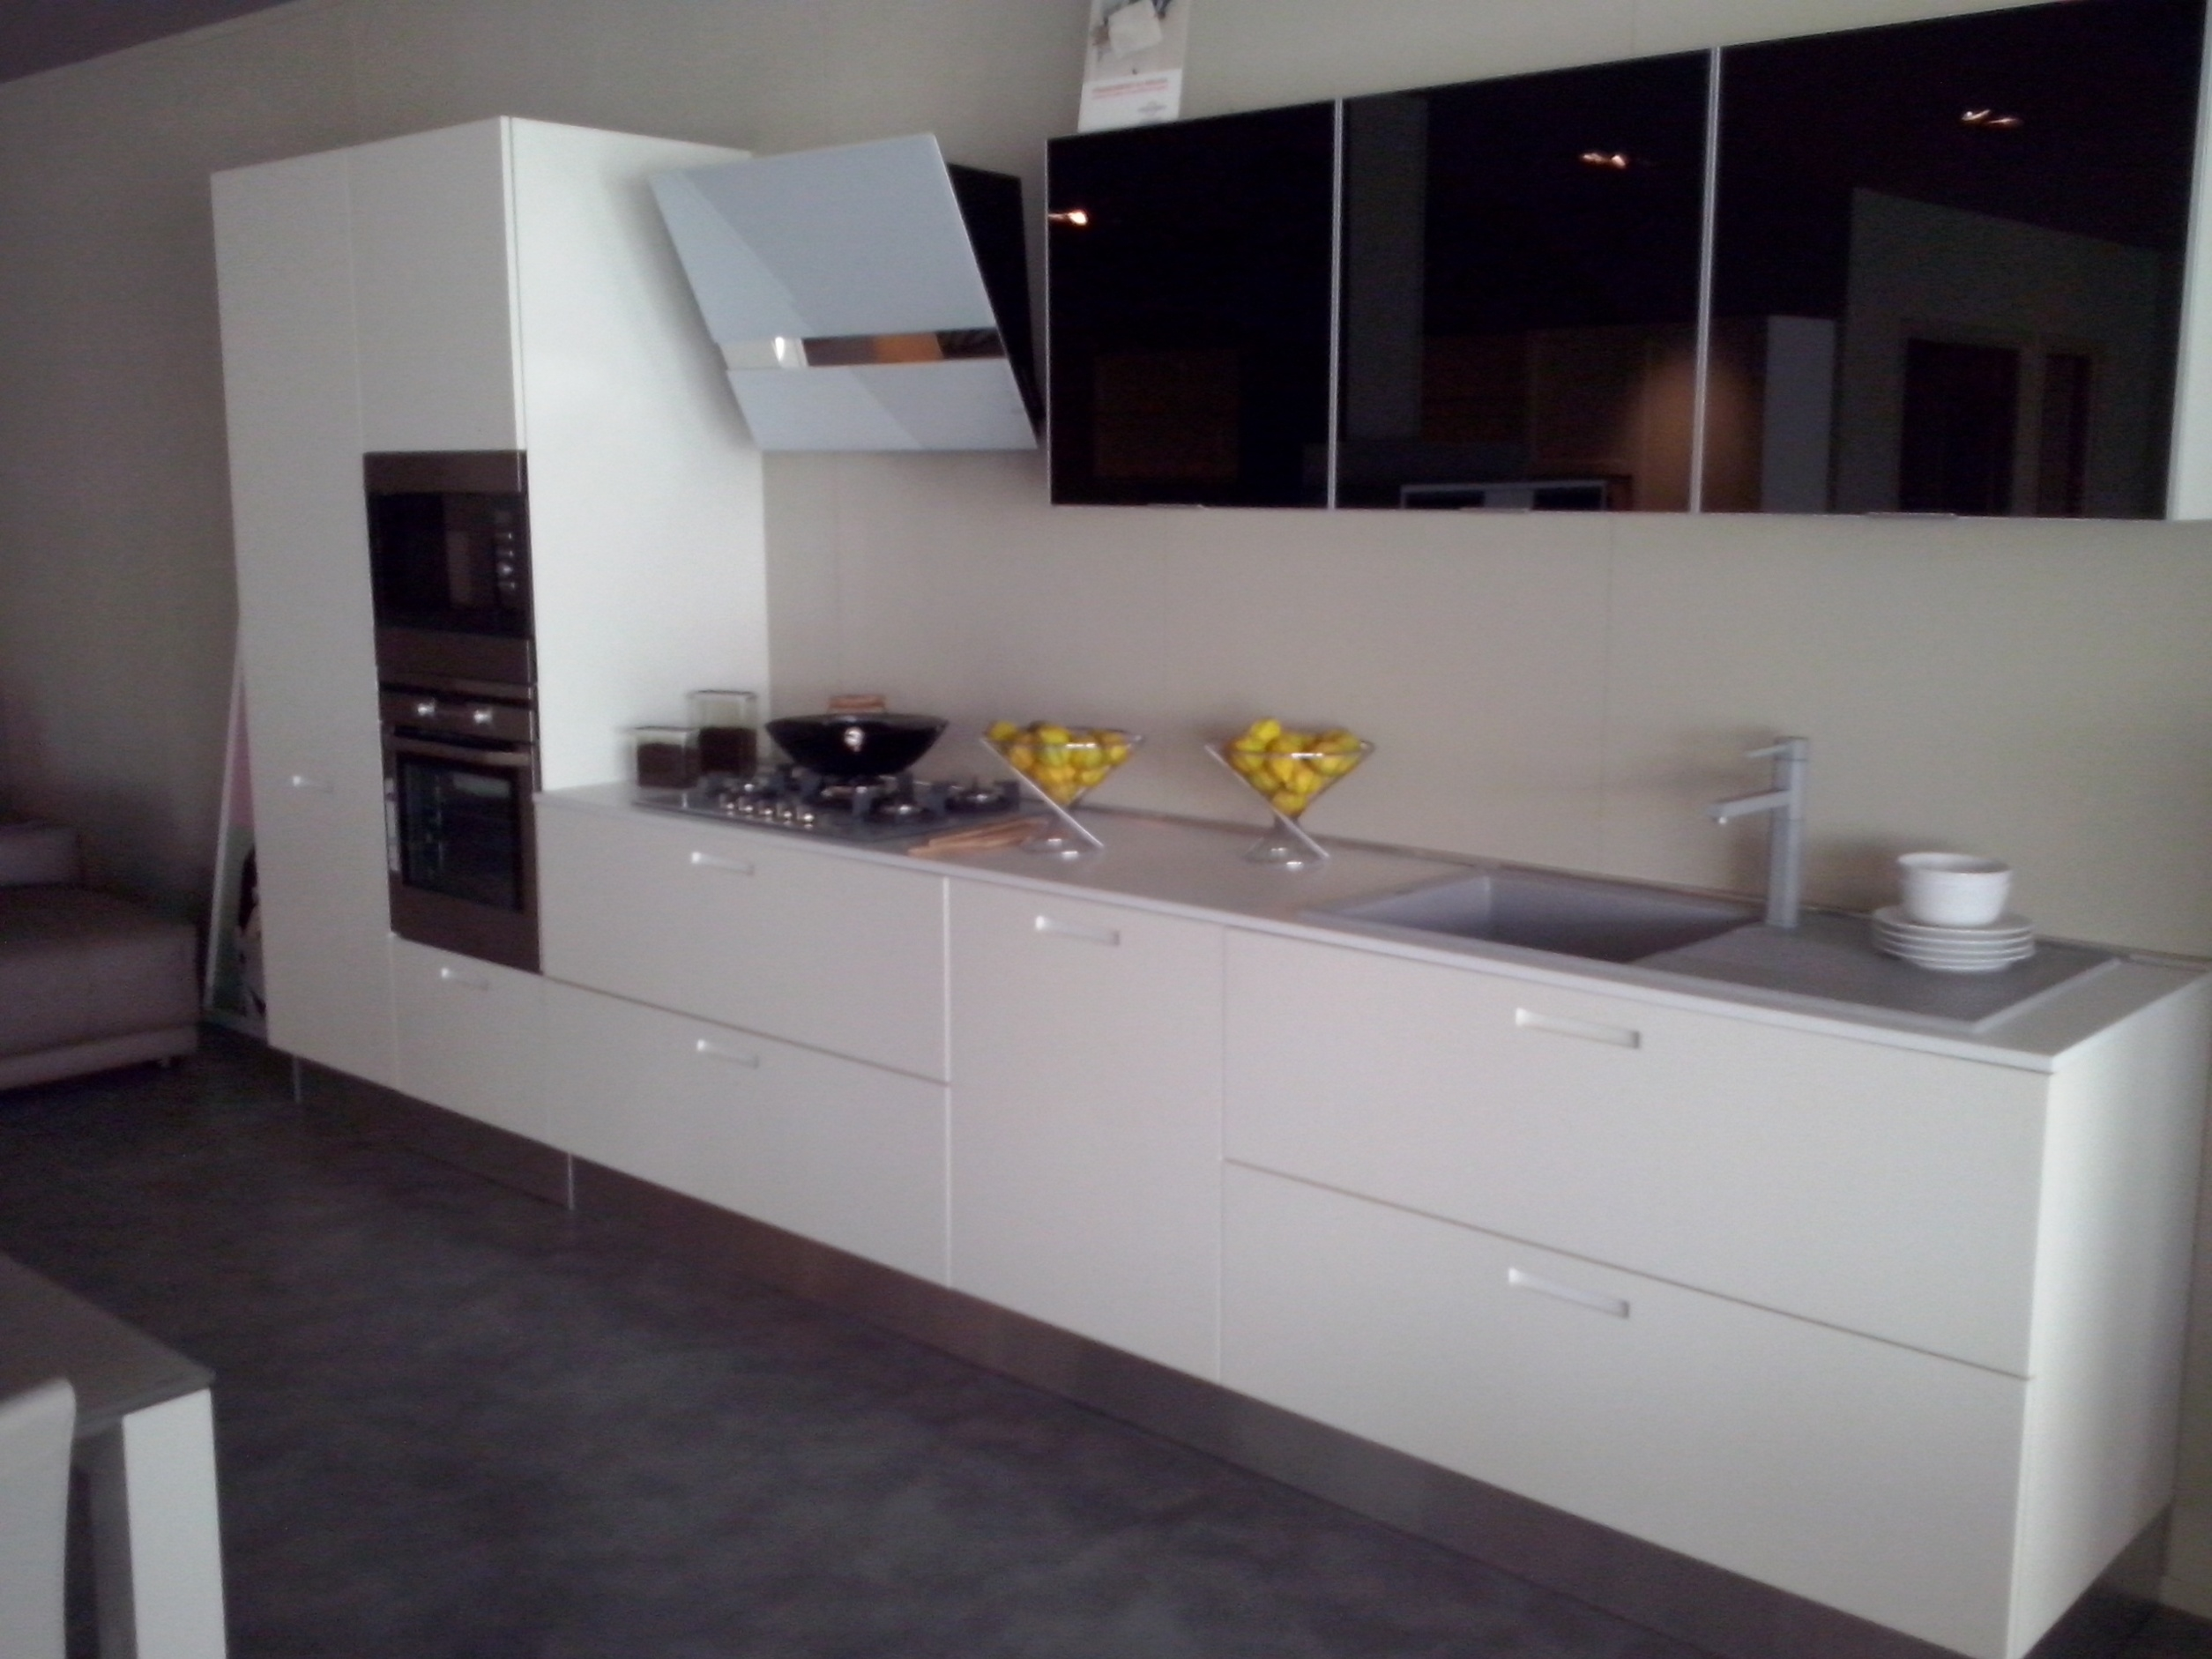 Cucine Moderne Colorate Anta Bianca Cucine Provincia Di Milano  # Mobiletto Cucina Color Melanzana